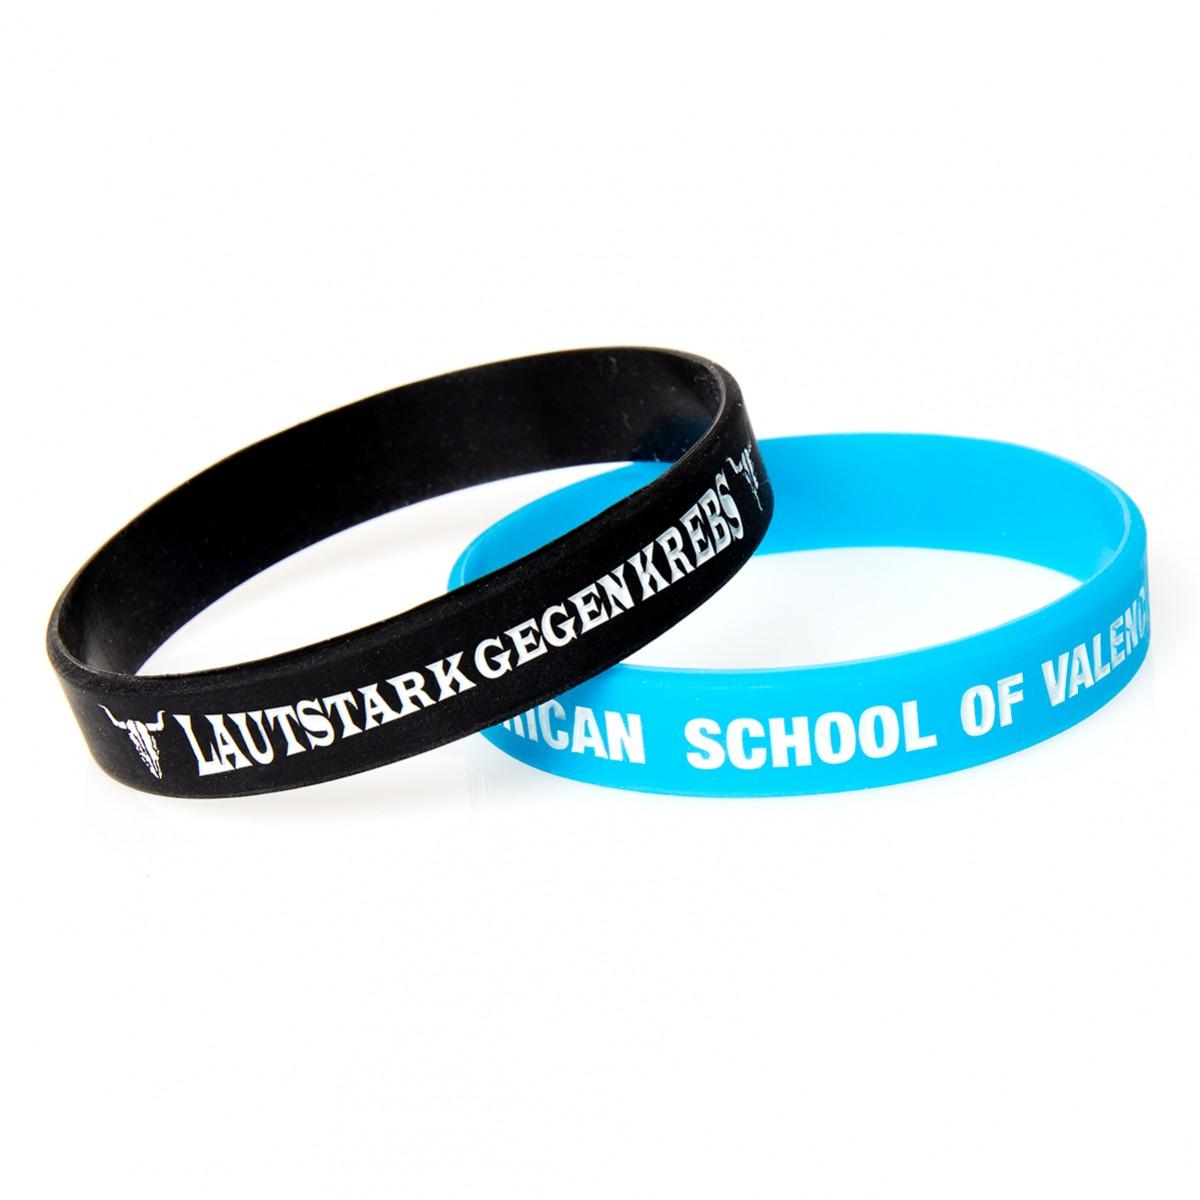 Silicone Wristbands, Custom Silicone Wristbands | Labelyourself